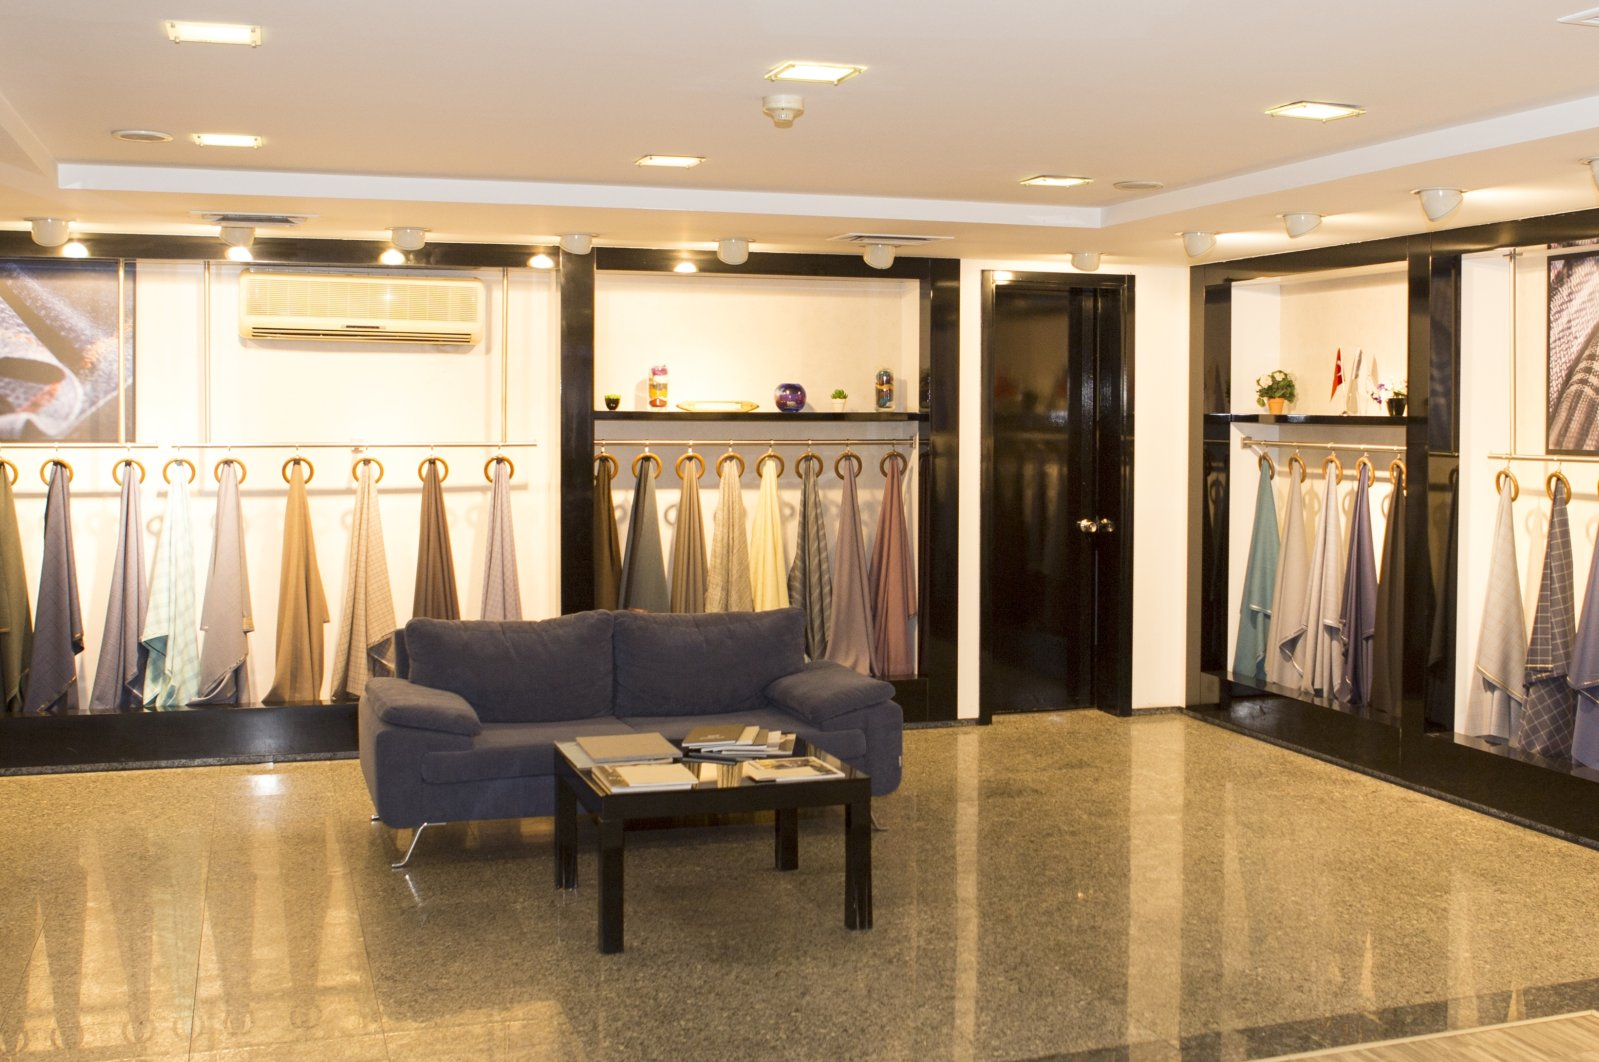 Fabric is on display in a space belonging to JMK Tekstil, Istanbul, provided on Oct. 5, 2020. (Photo by JMK Tekstil via AA)